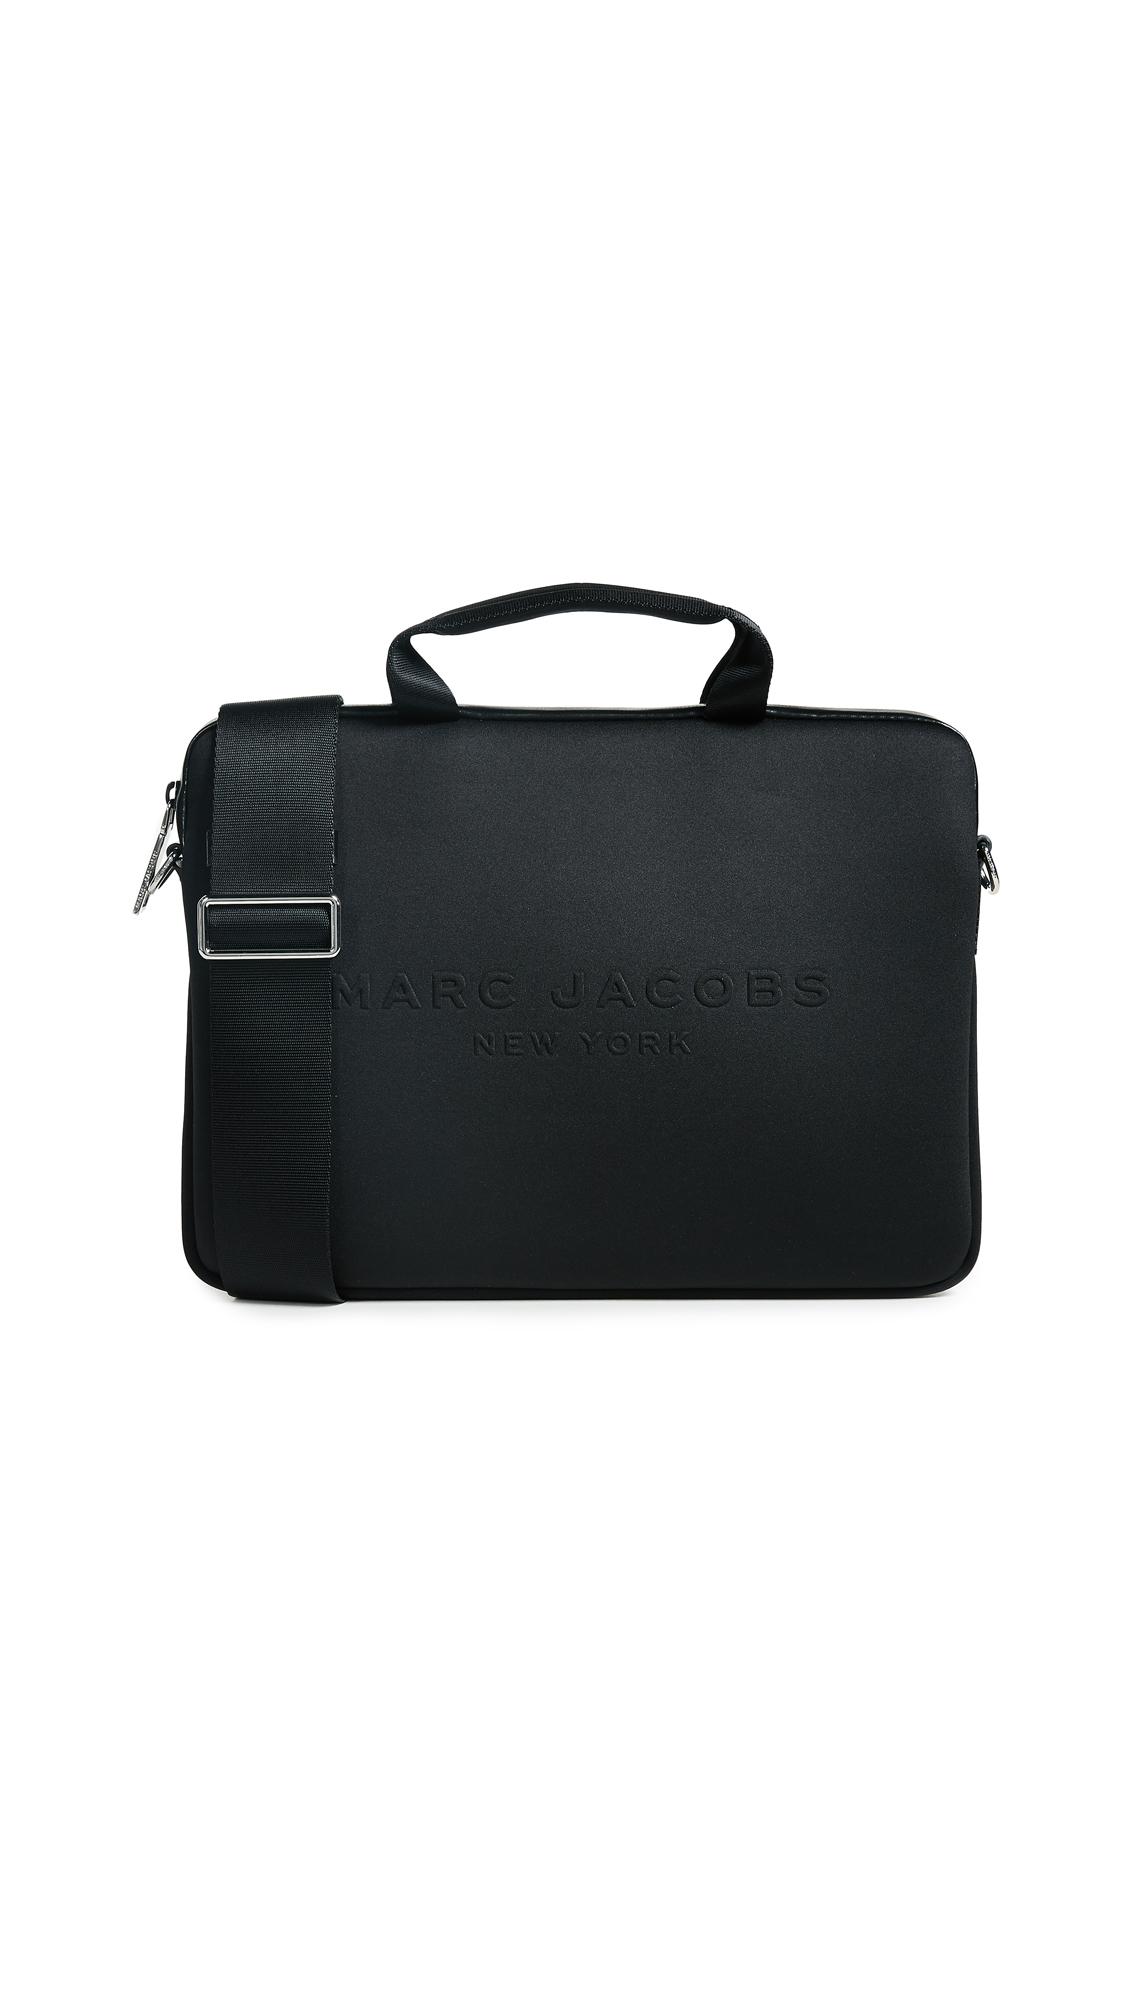 Marc Jacobs 13 Commuter Neoprene Computer Case